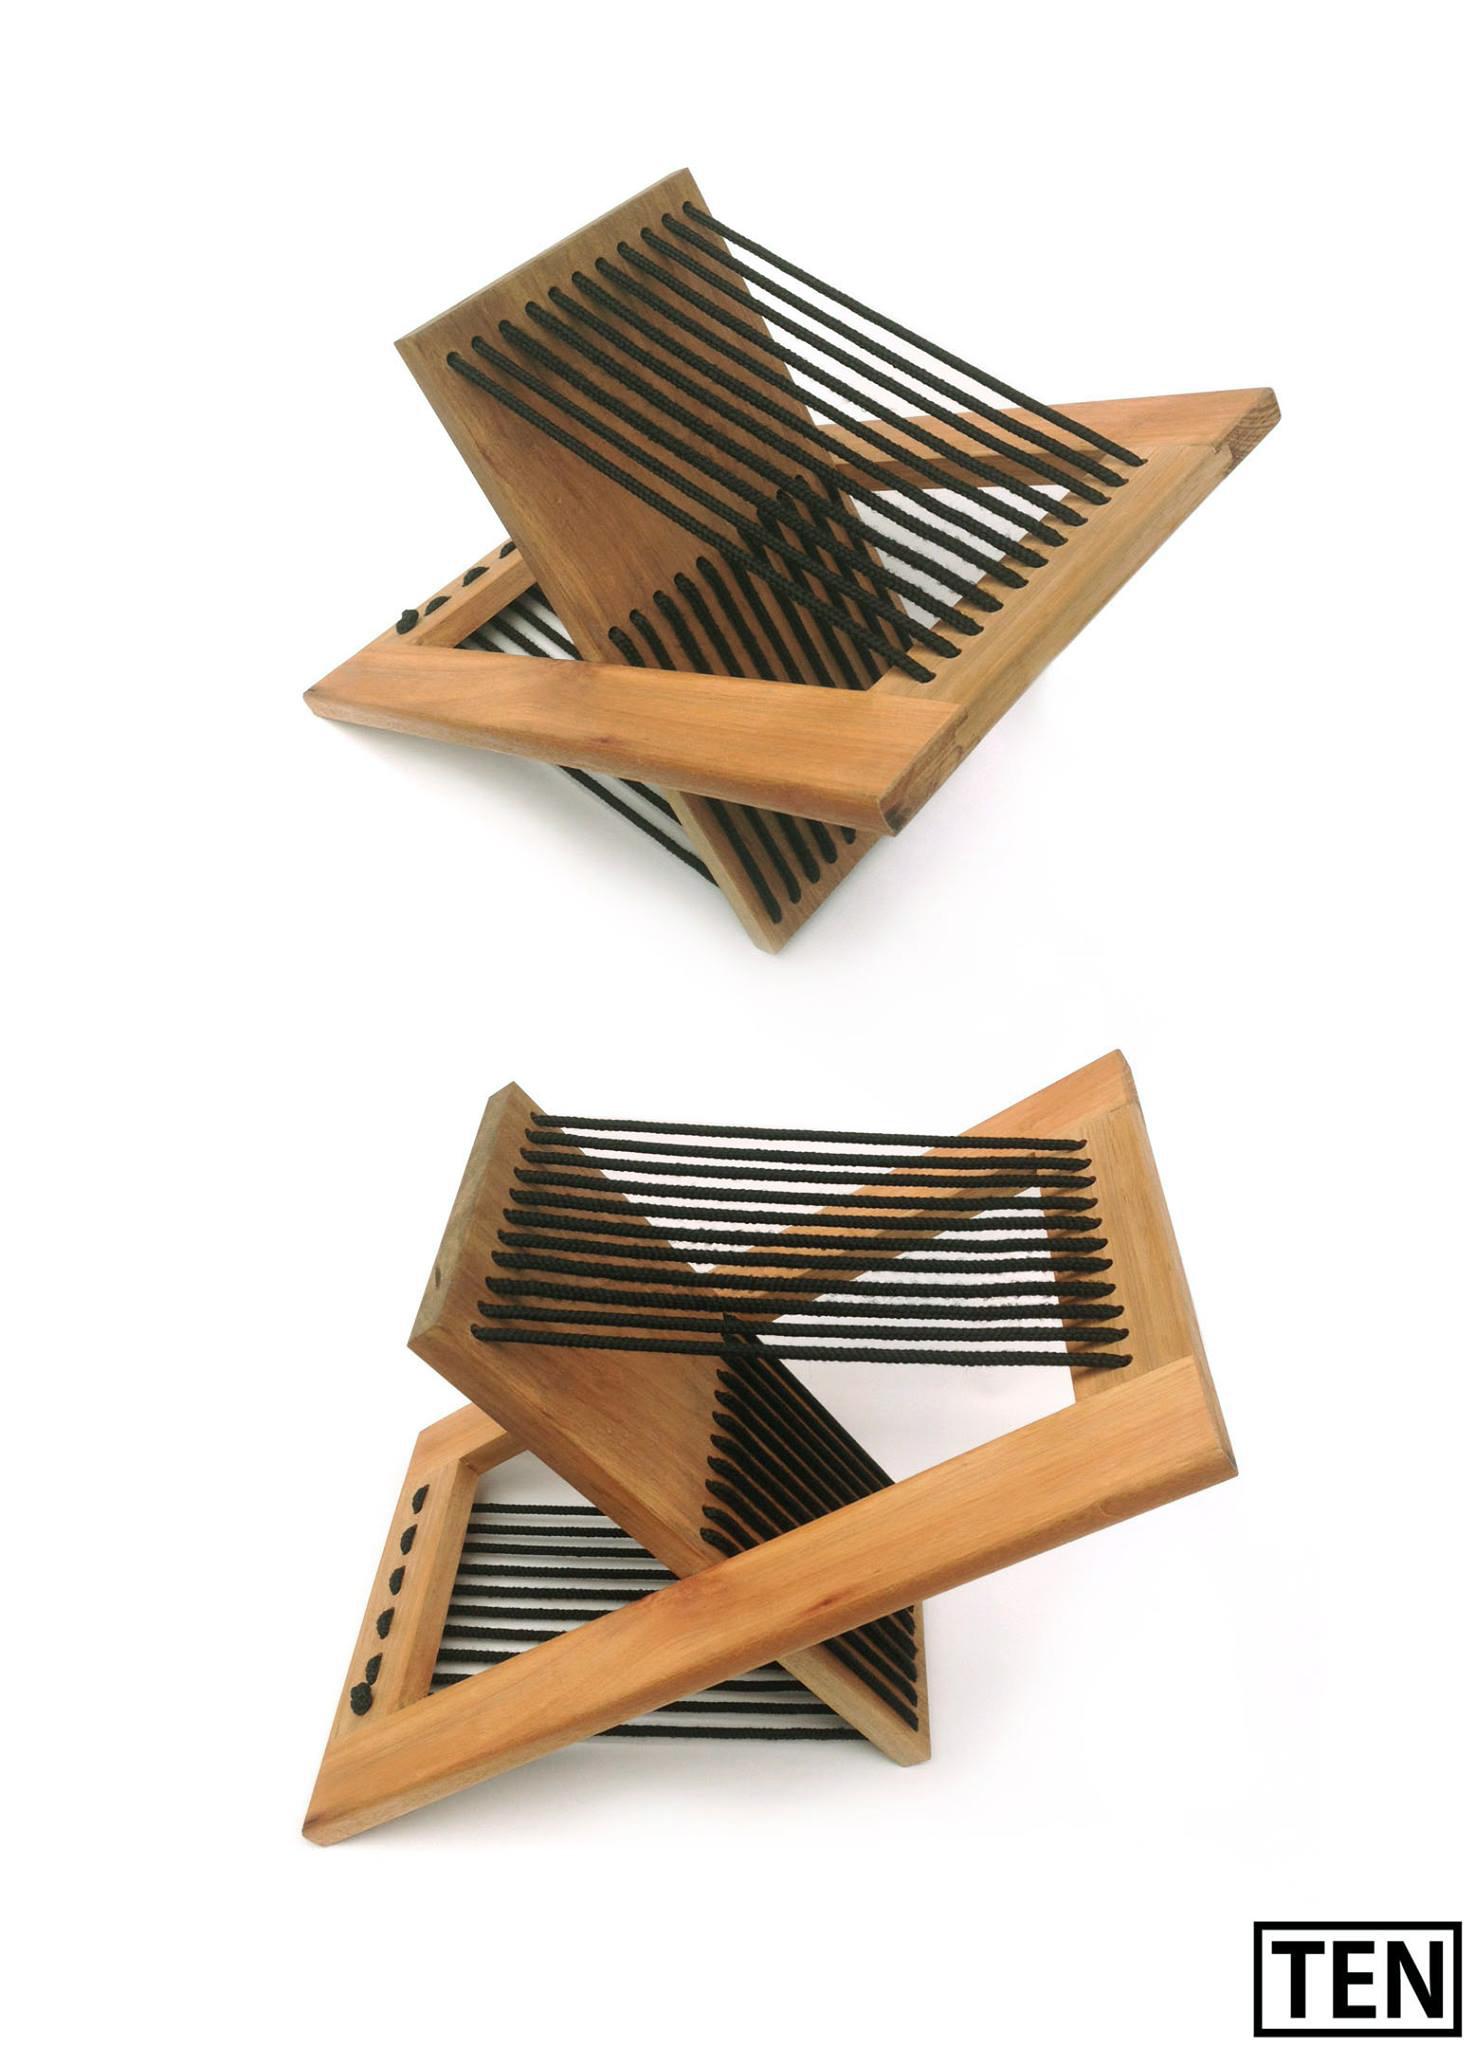 Galeria De Mesa Lateral Dobr Vel Ten Muebles 6 # Federico Muebles